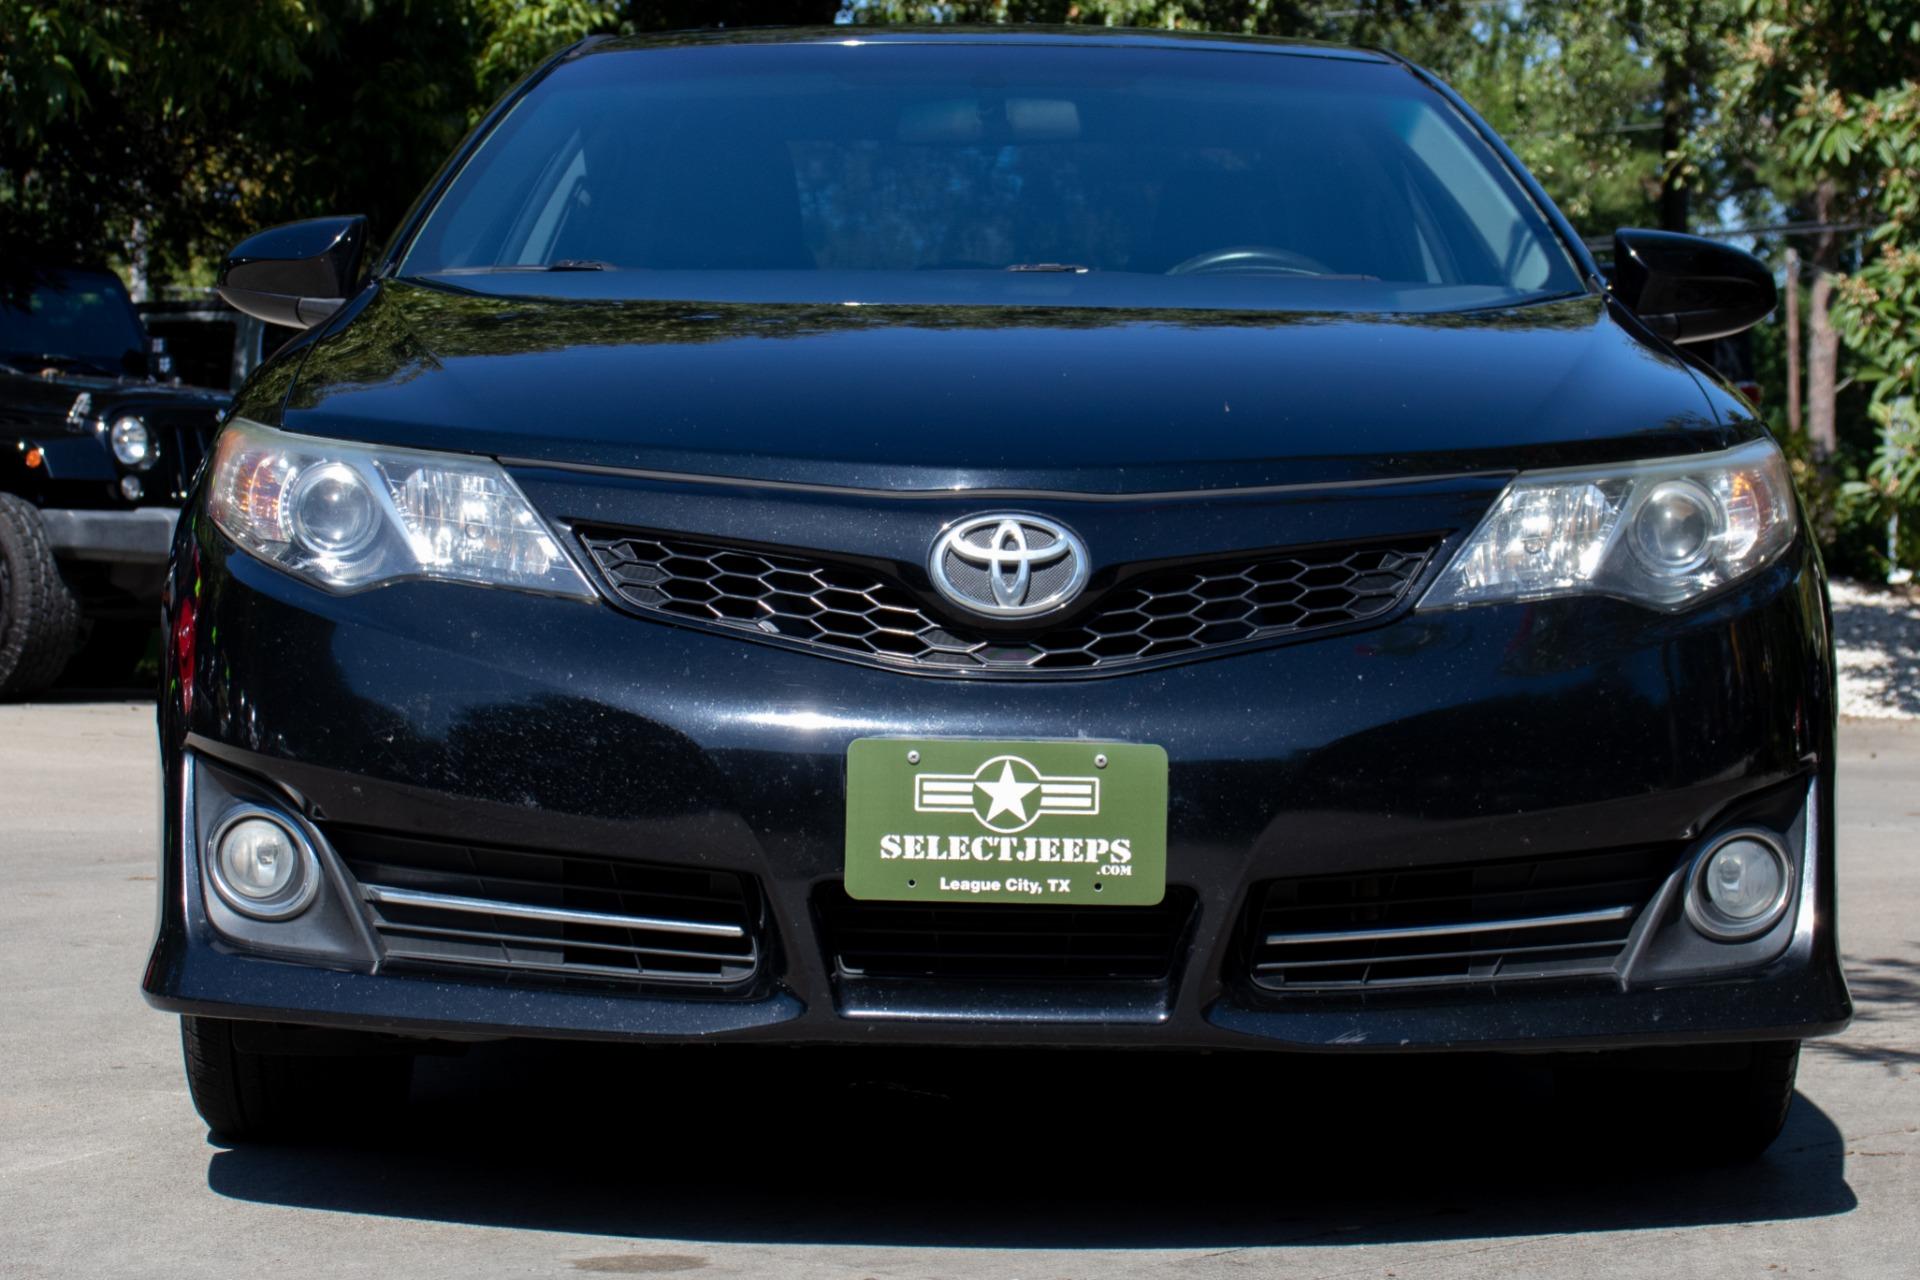 Used-2014-Toyota-Camry-SE